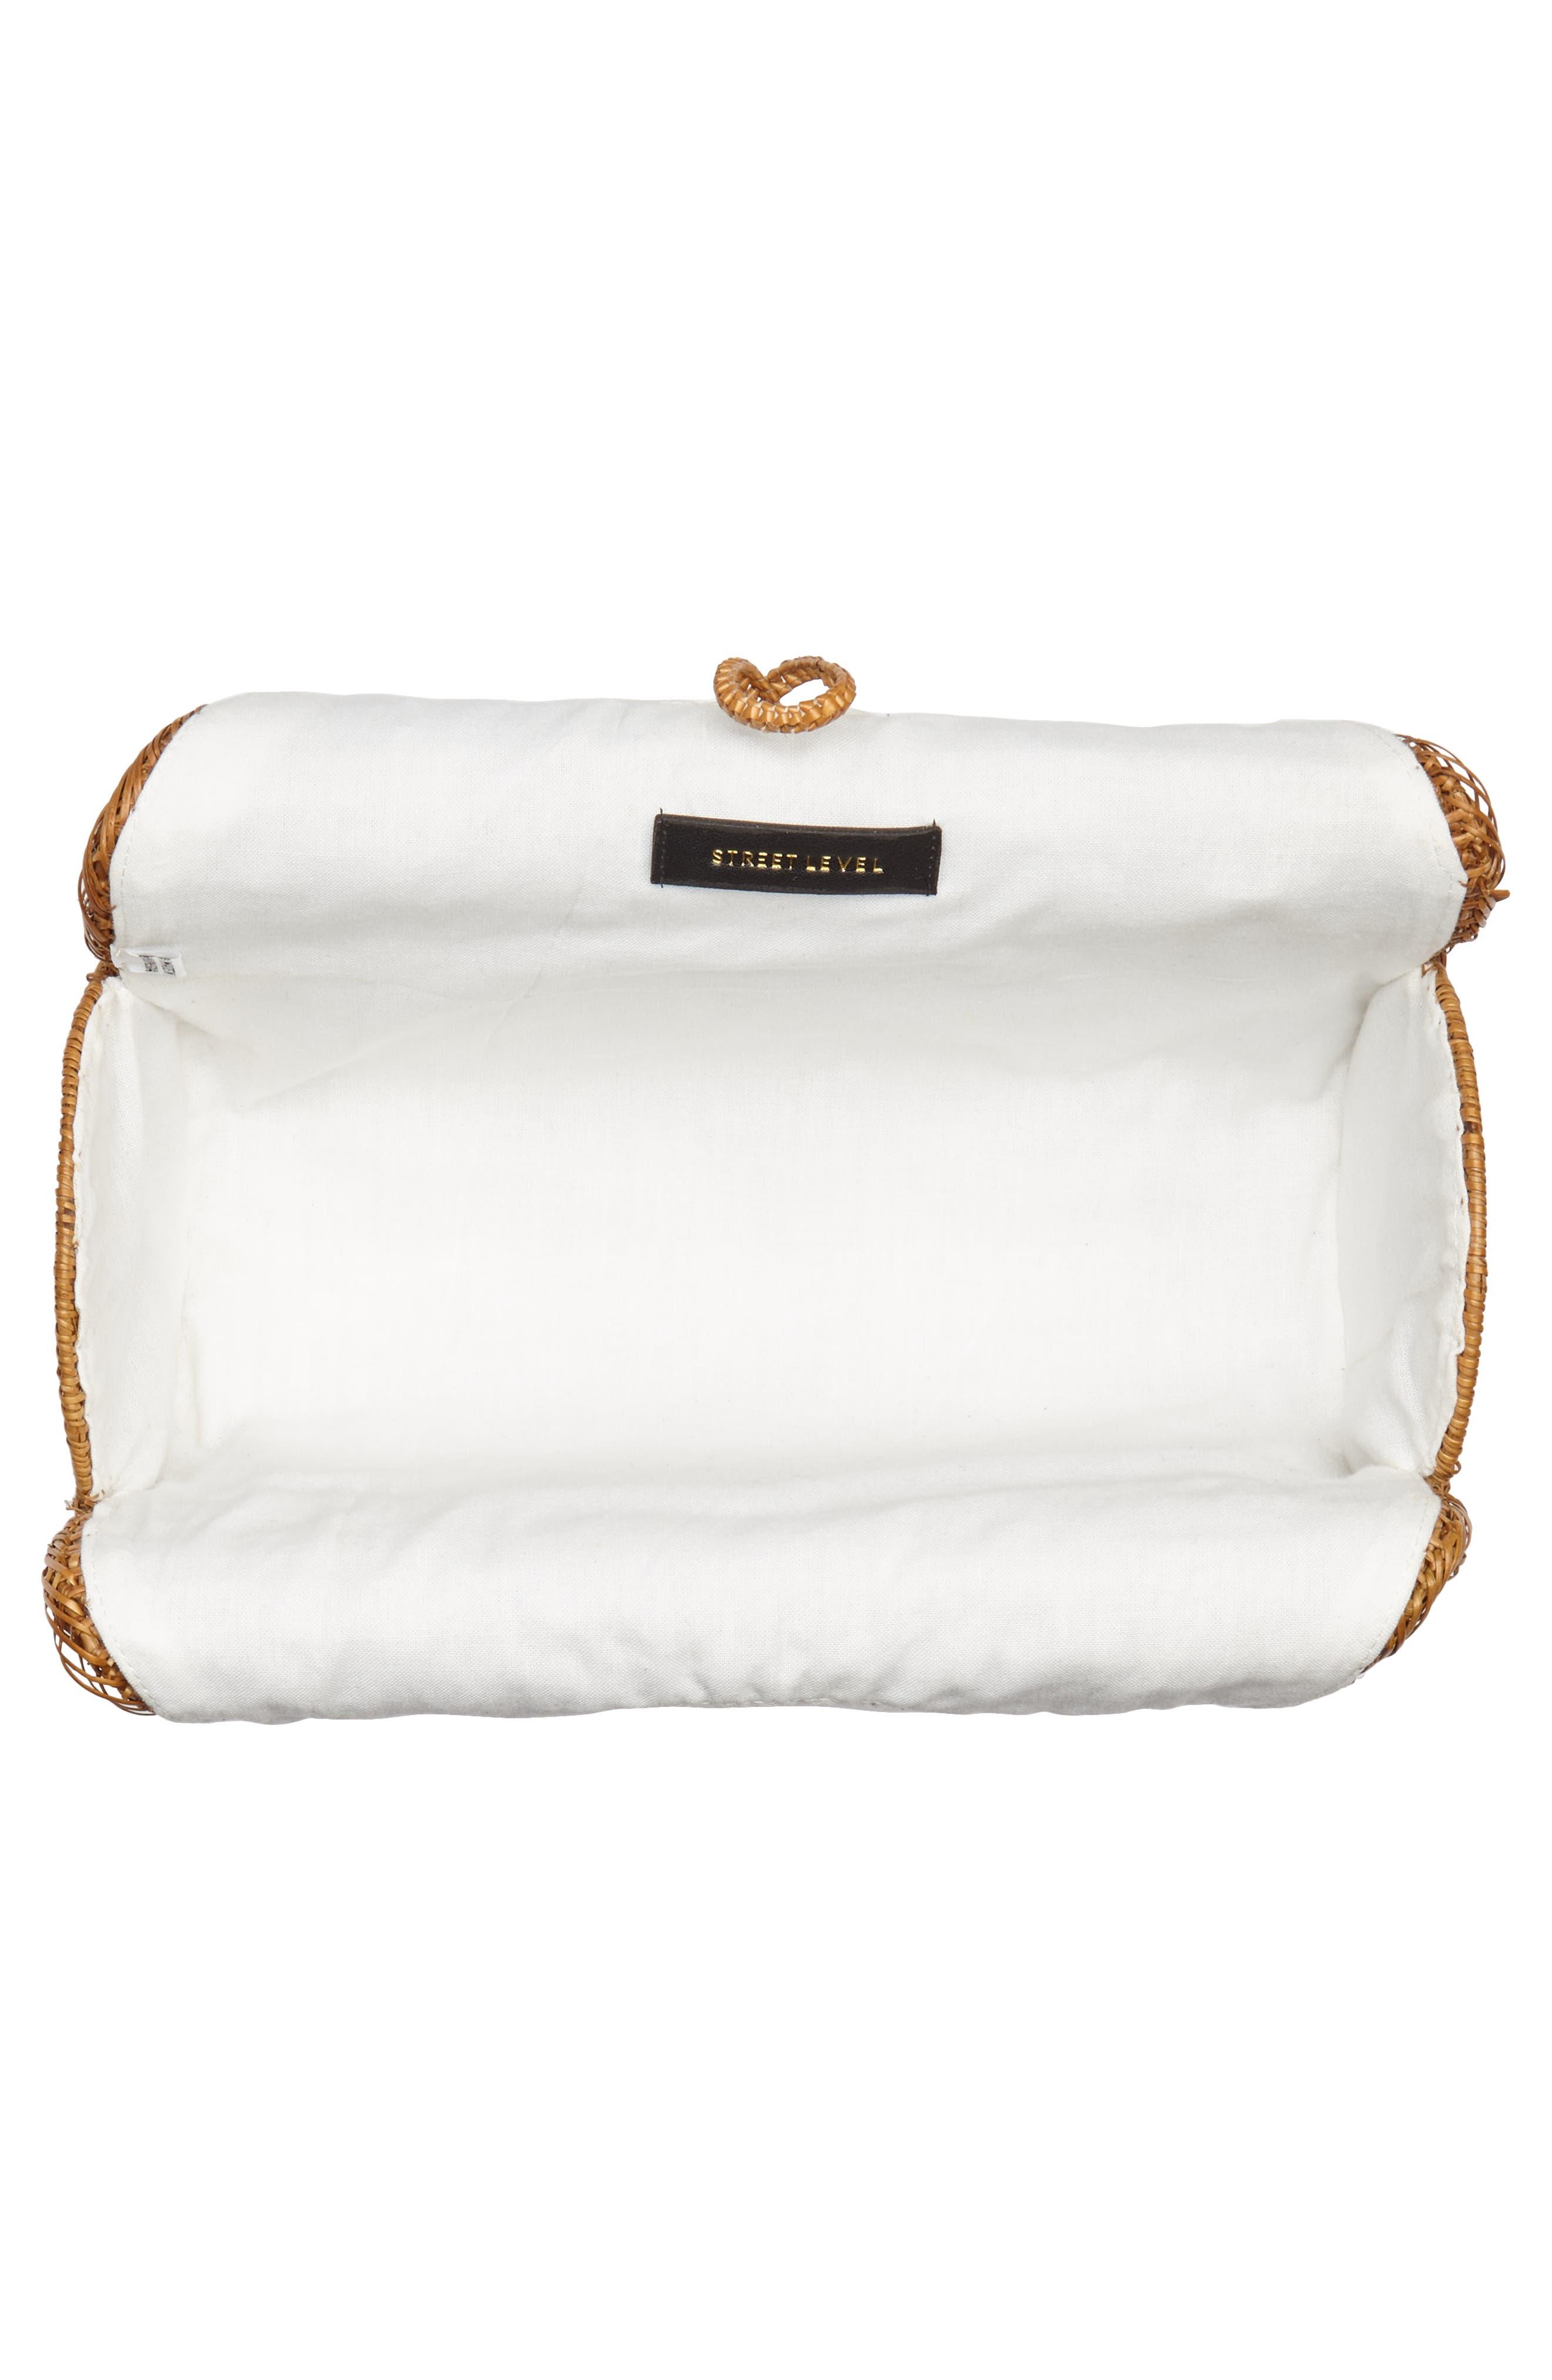 Woven Rattan Handbag,                             Alternate thumbnail 4, color,                             Tan